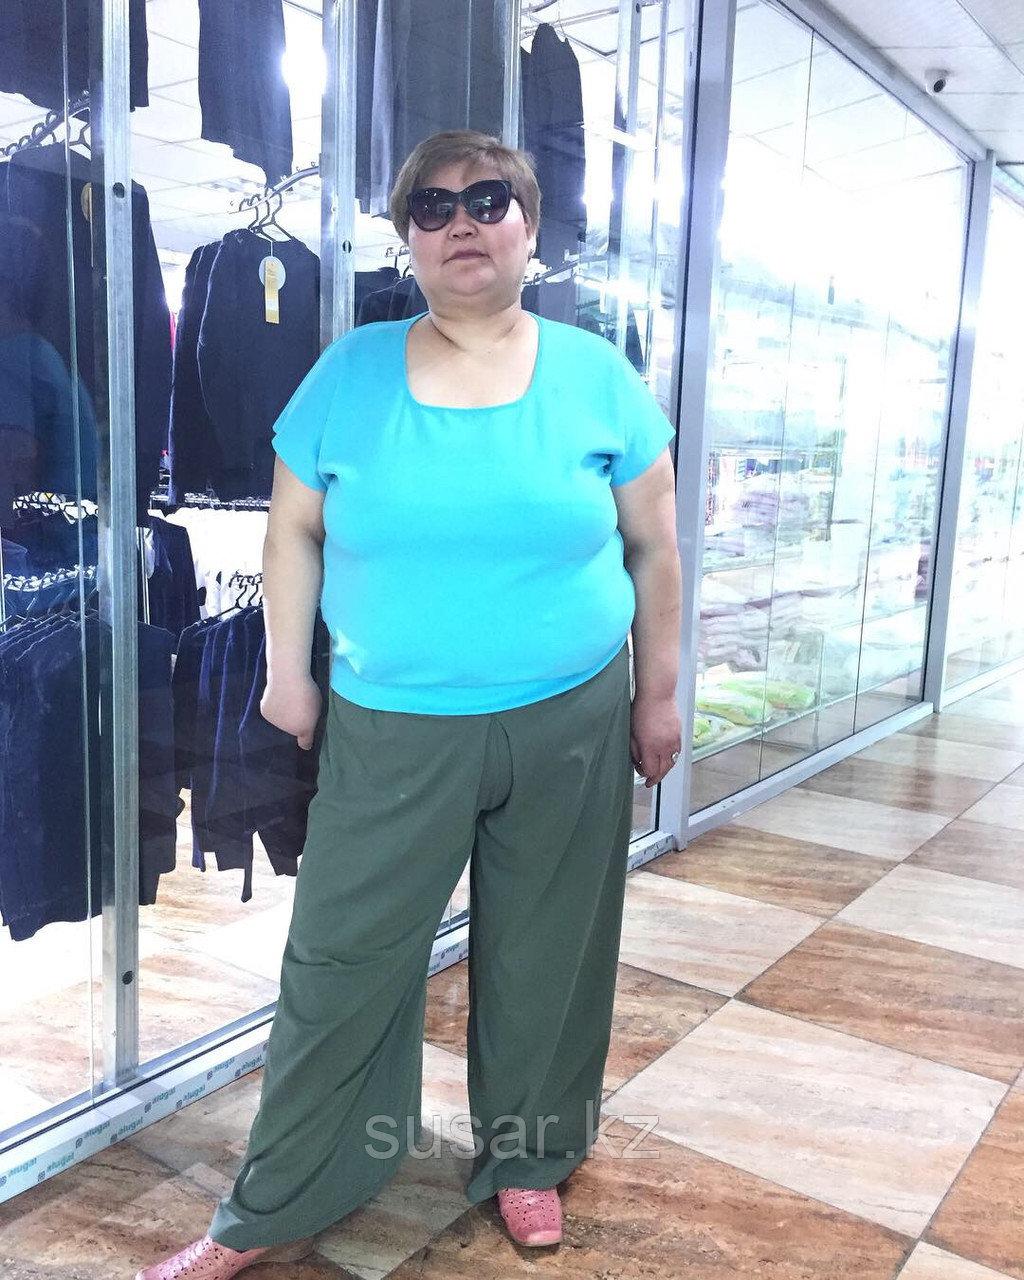 Юбка-брюки  от  Susar